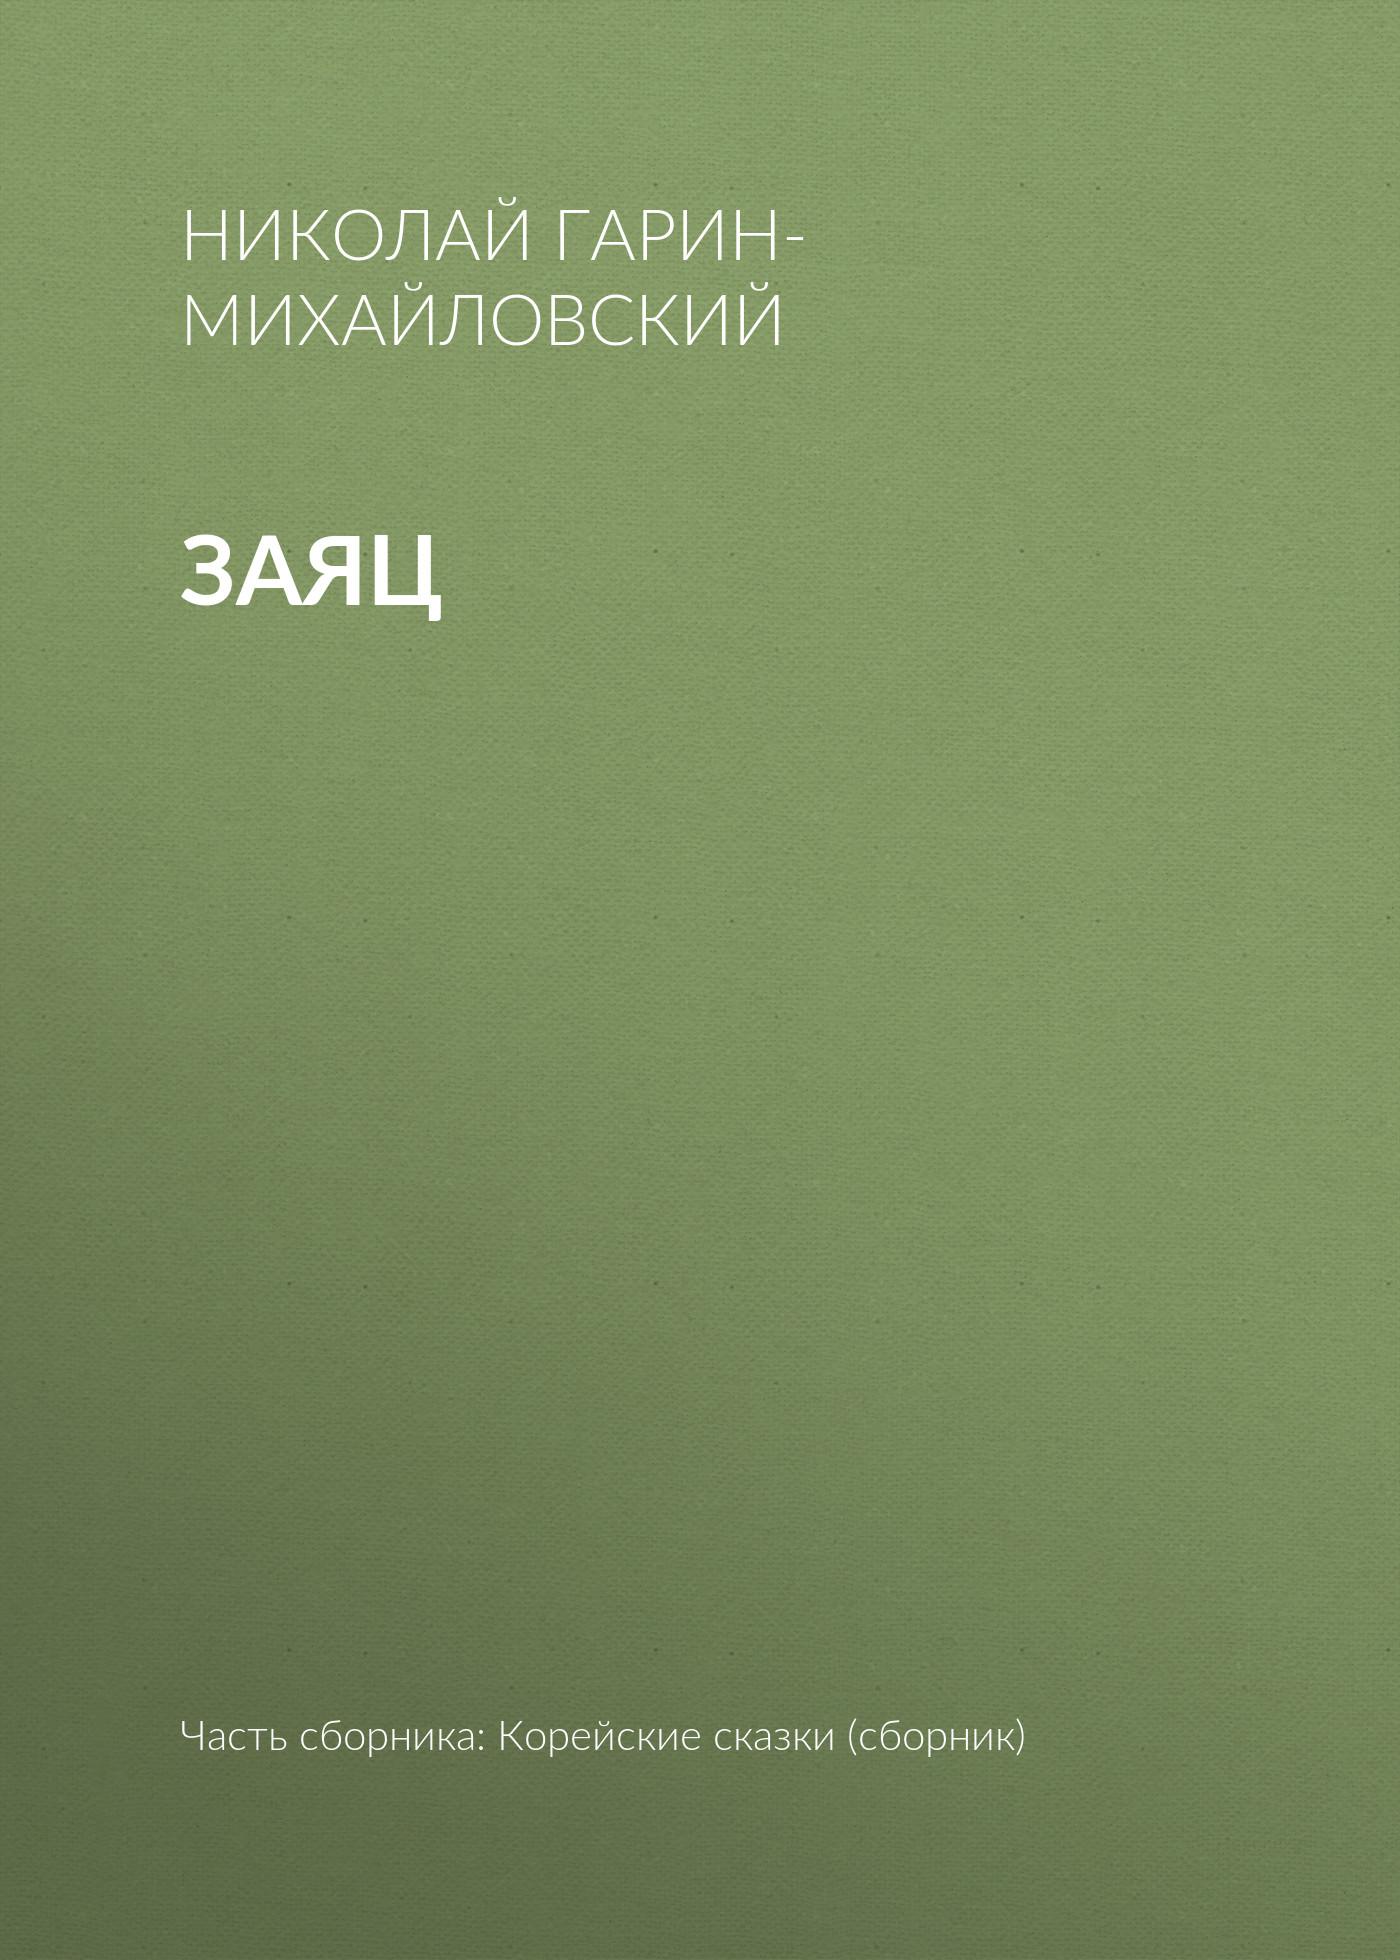 Николай Гарин-Михайловский Заяц